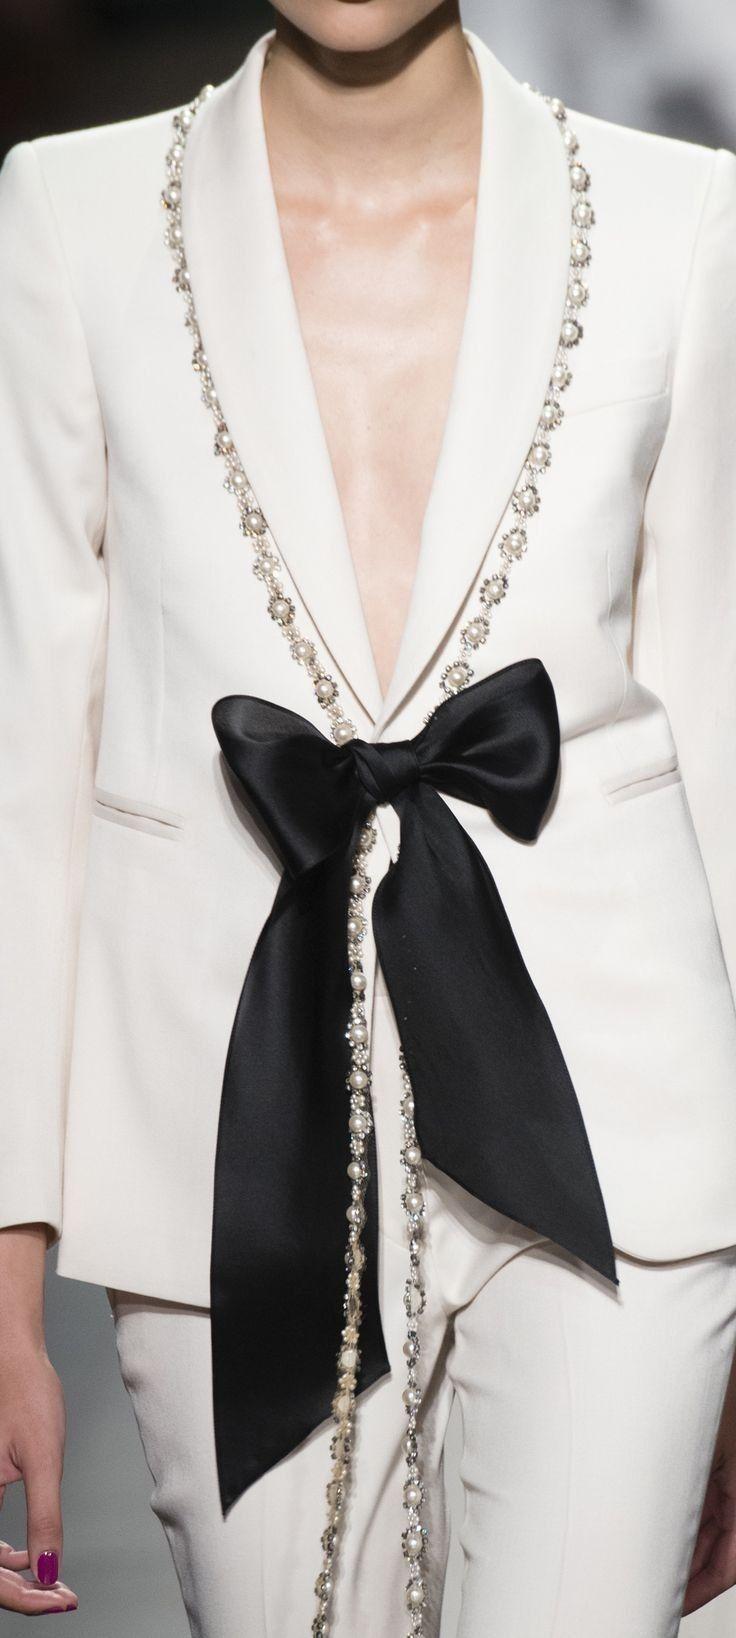 Ilde Adli Kullanicinin L Eleganza In Bianco E Nero Panosundaki Pin Siyah Beyaz Siyah